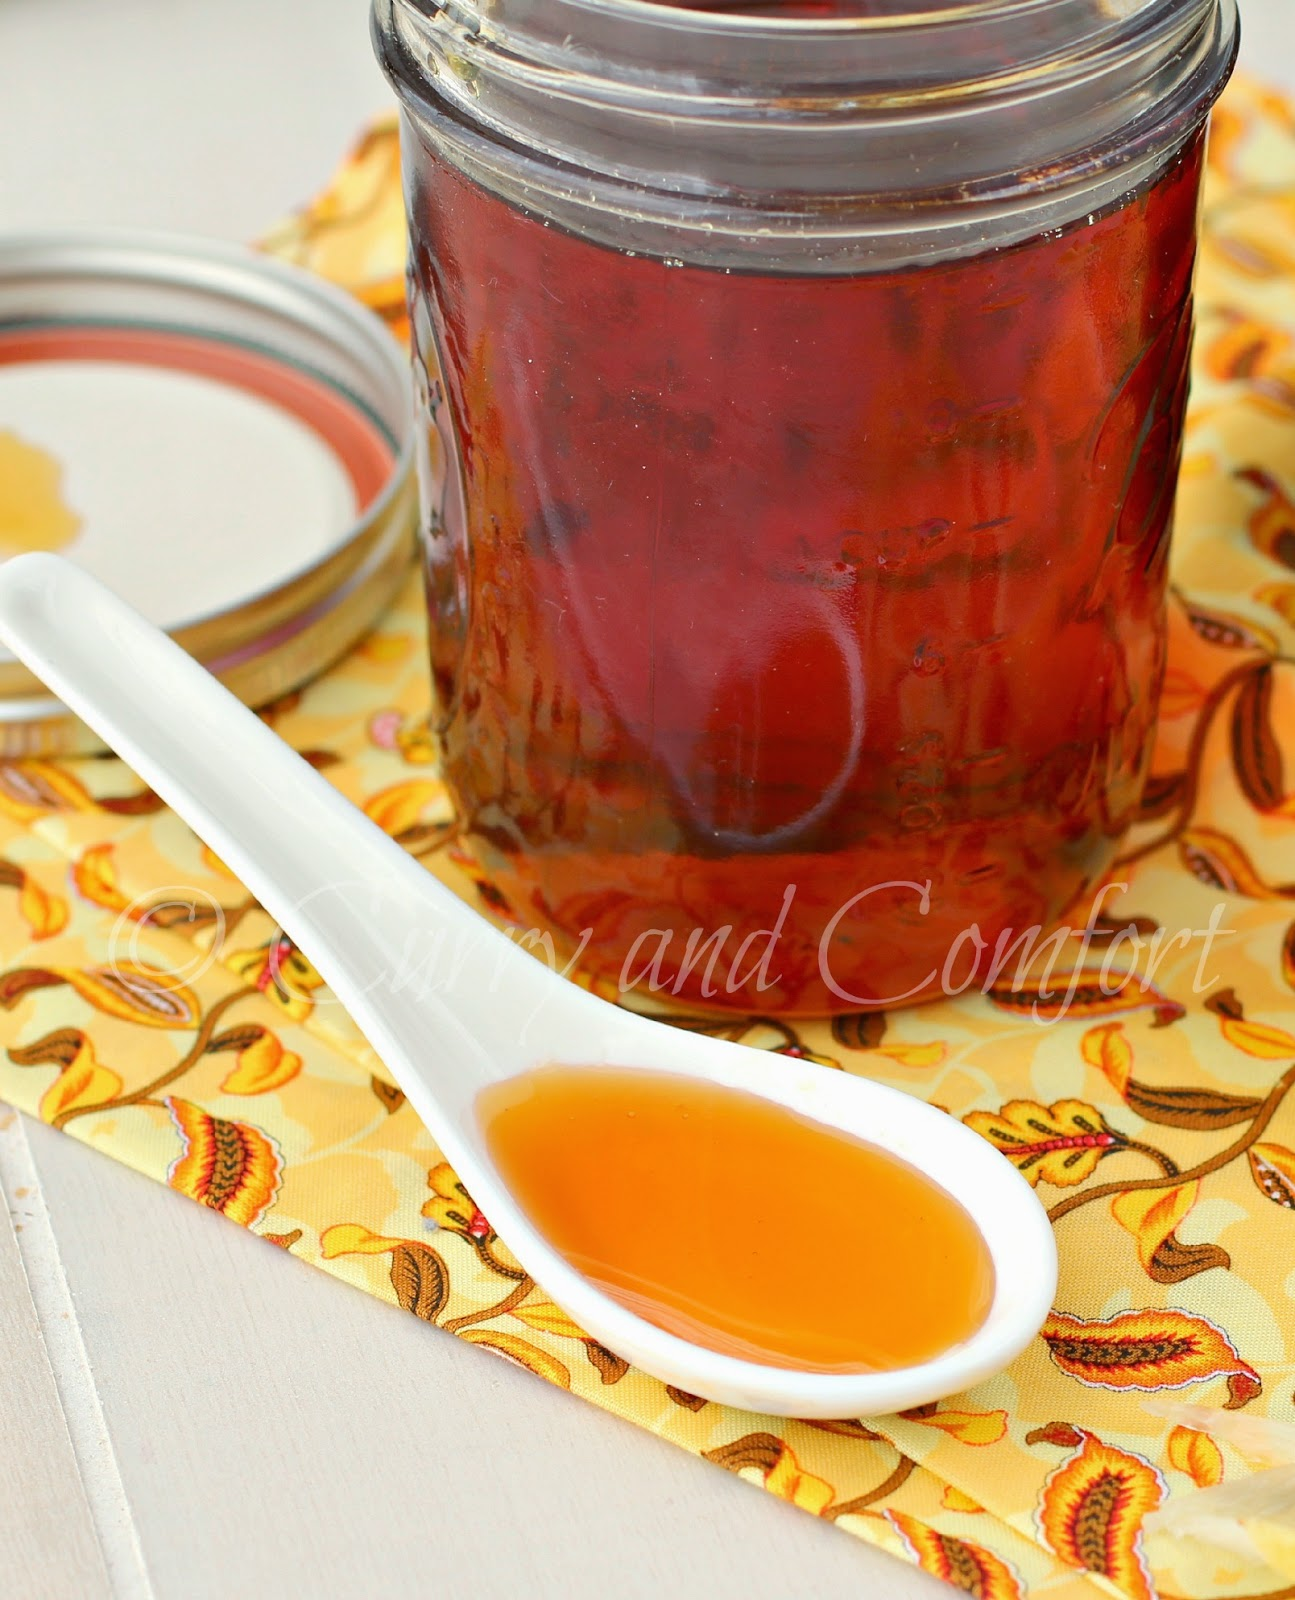 Todd S Kitchen Golden Syrup Recipe